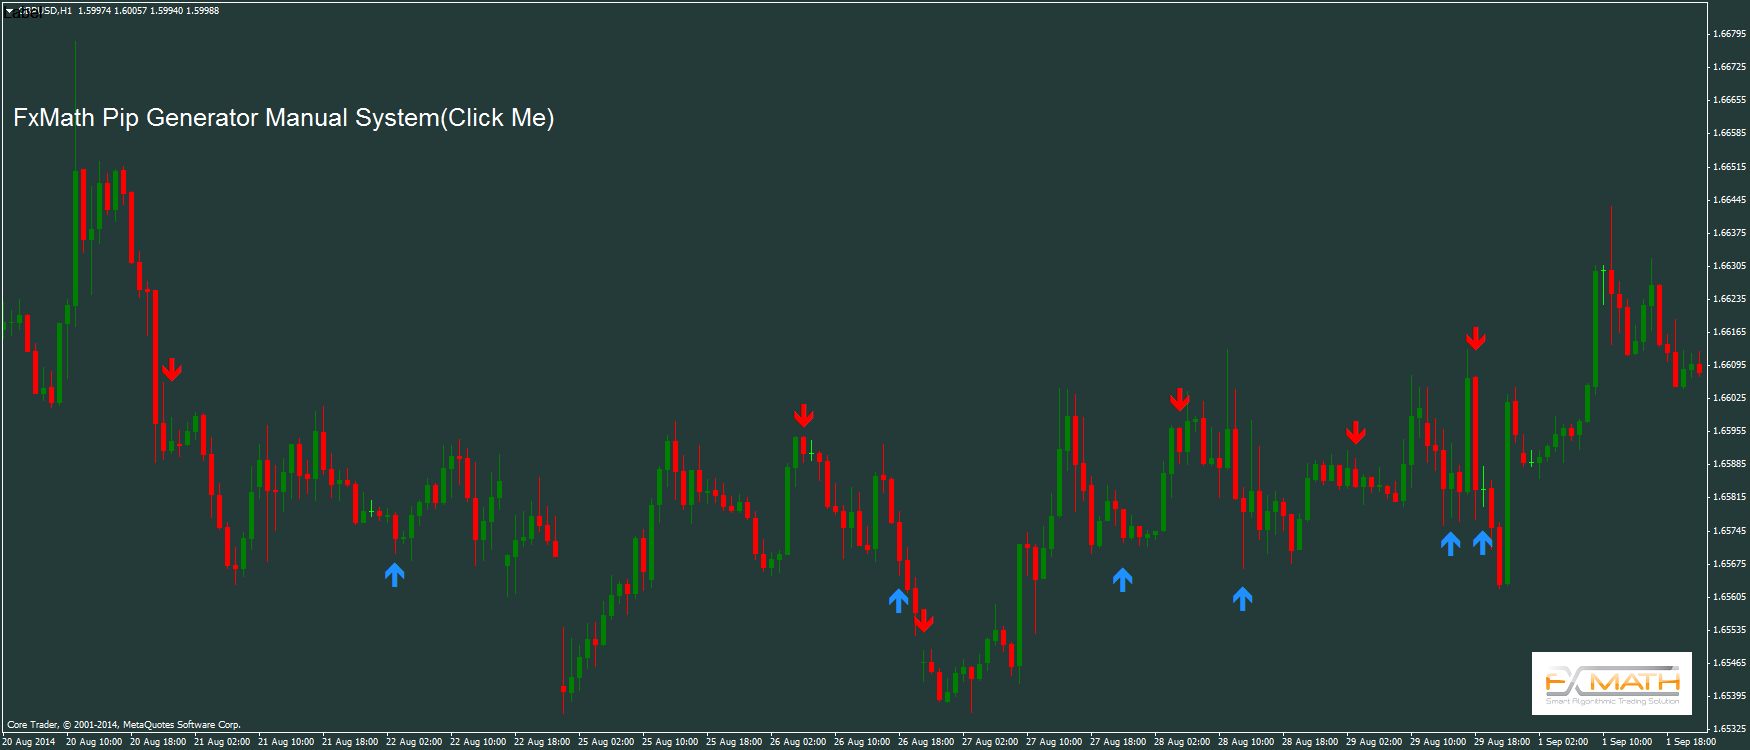 Forex market liquidity indicator